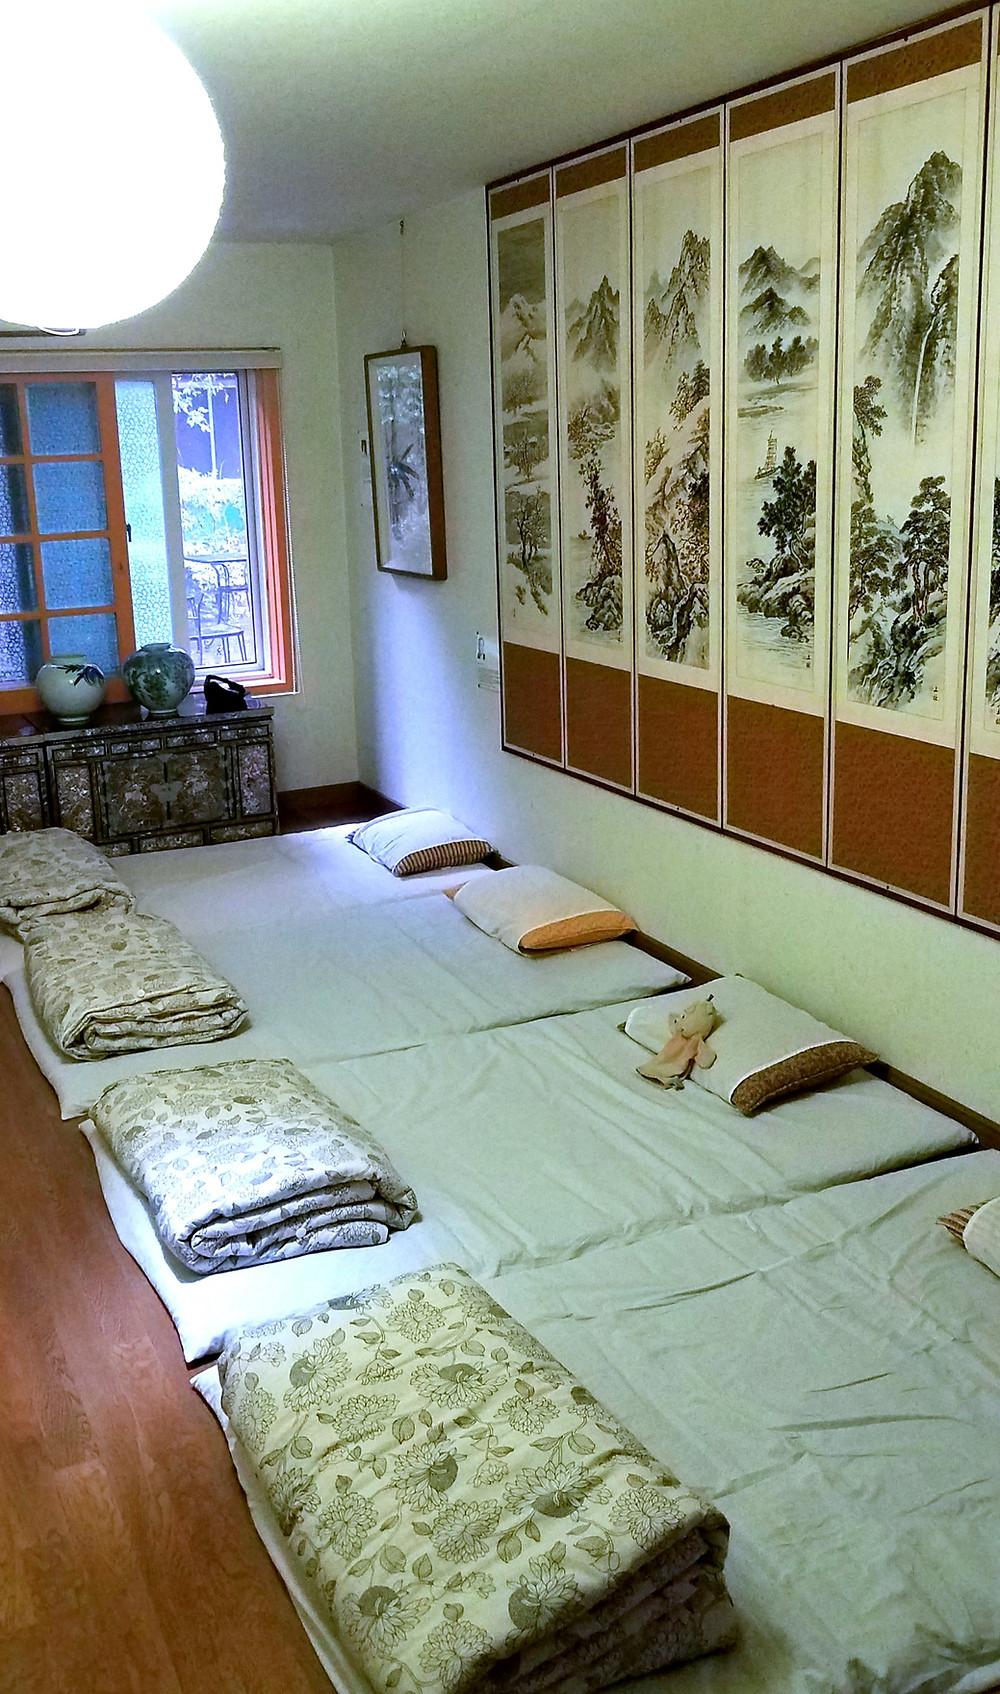 Jeonju guesthouse, hanok village